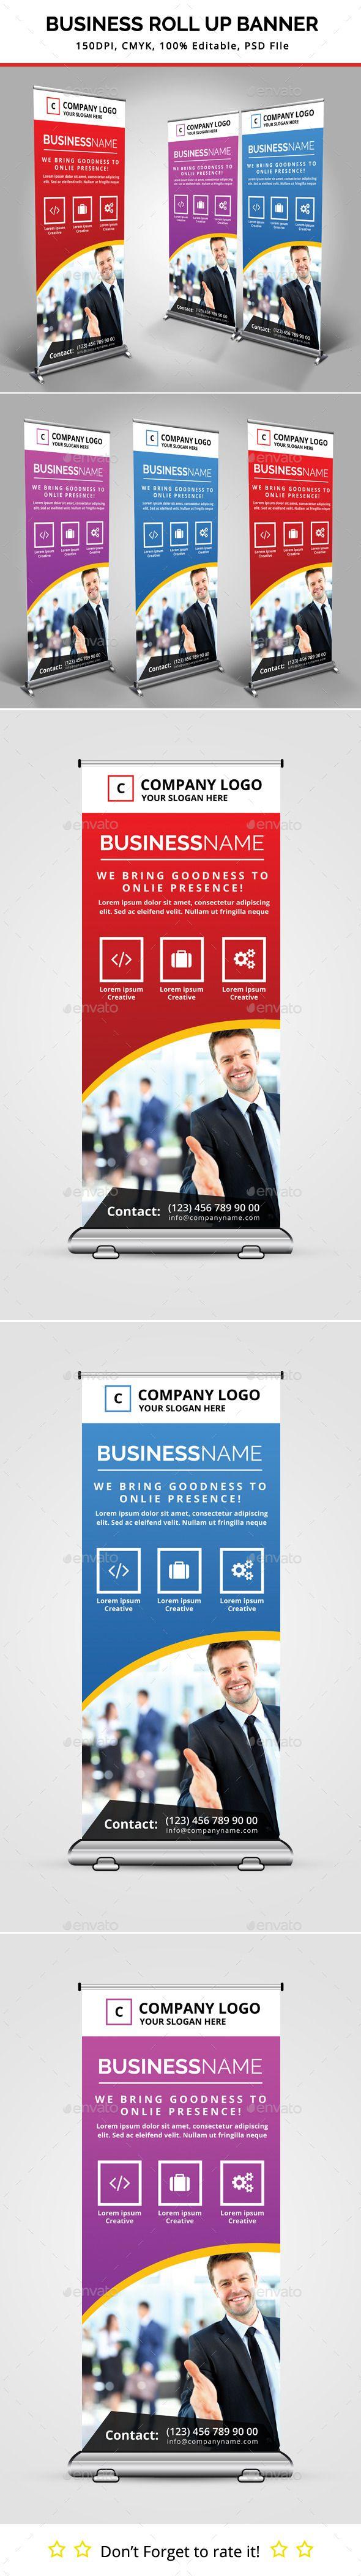 Business Roll Up Banner Template #design Download: http://graphicriver.net/item/business-roll-up-banner/11330772?ref=ksioks